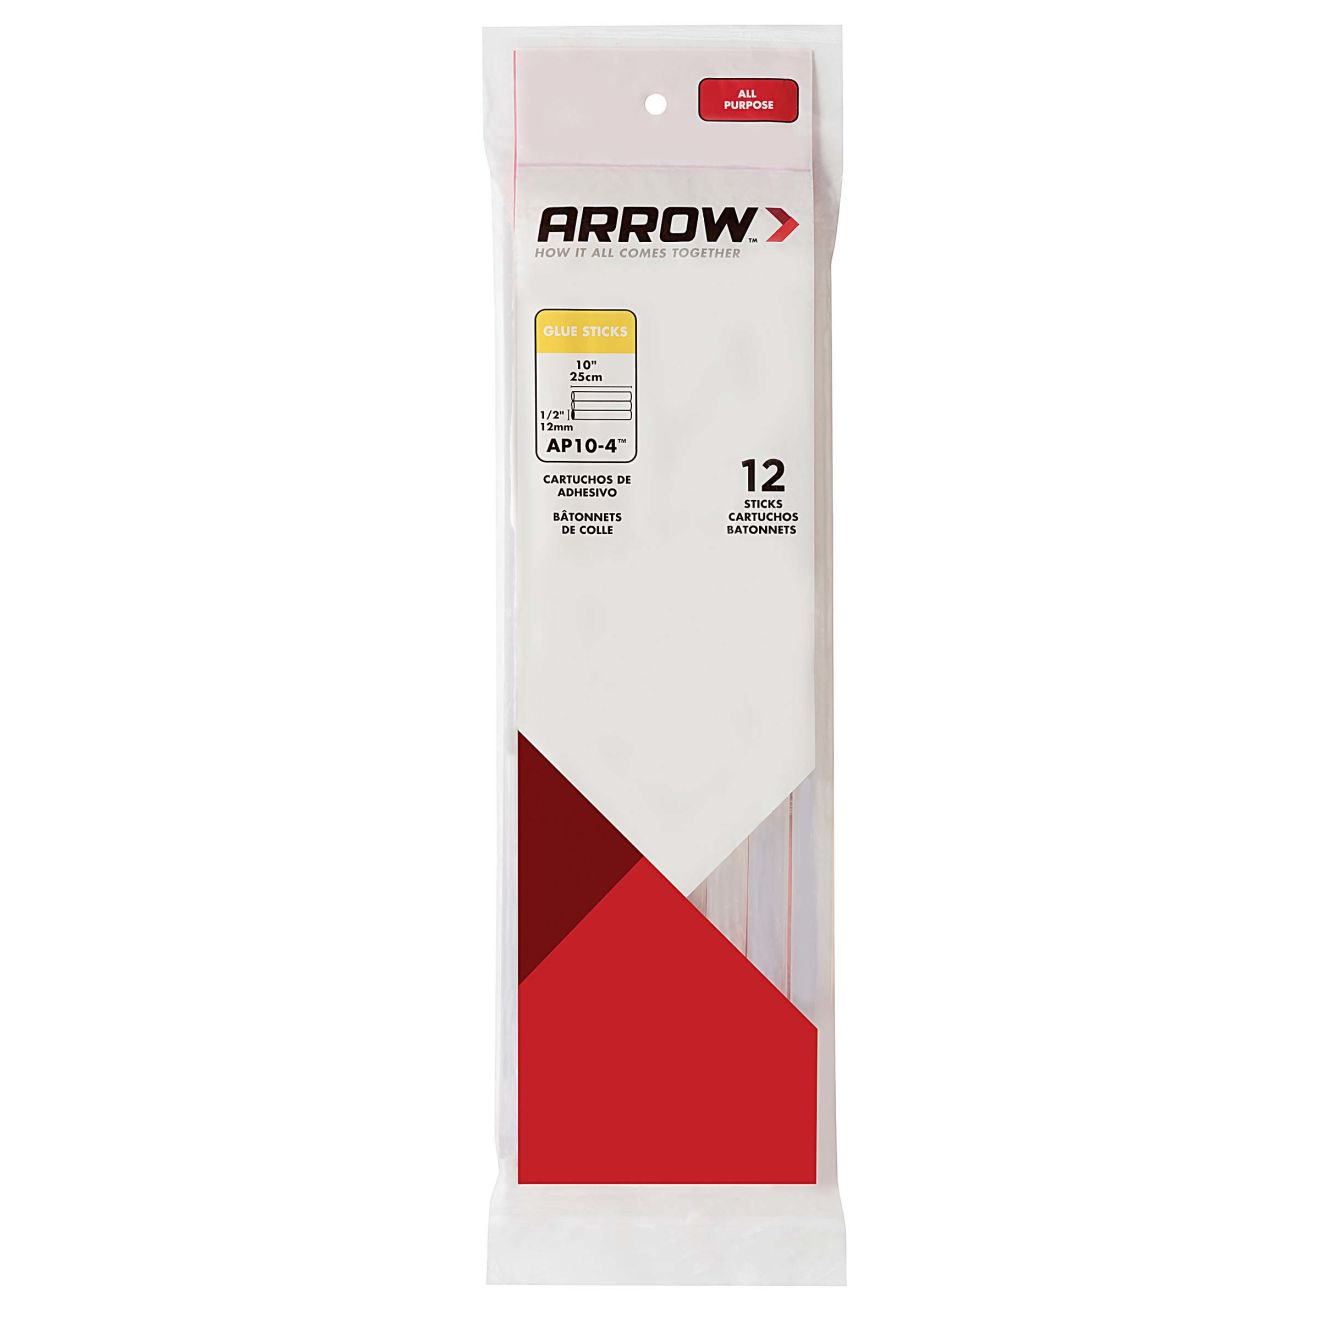 Arrow 4 oz. All-Purpose Clear Glue Sticks (12-Pack)